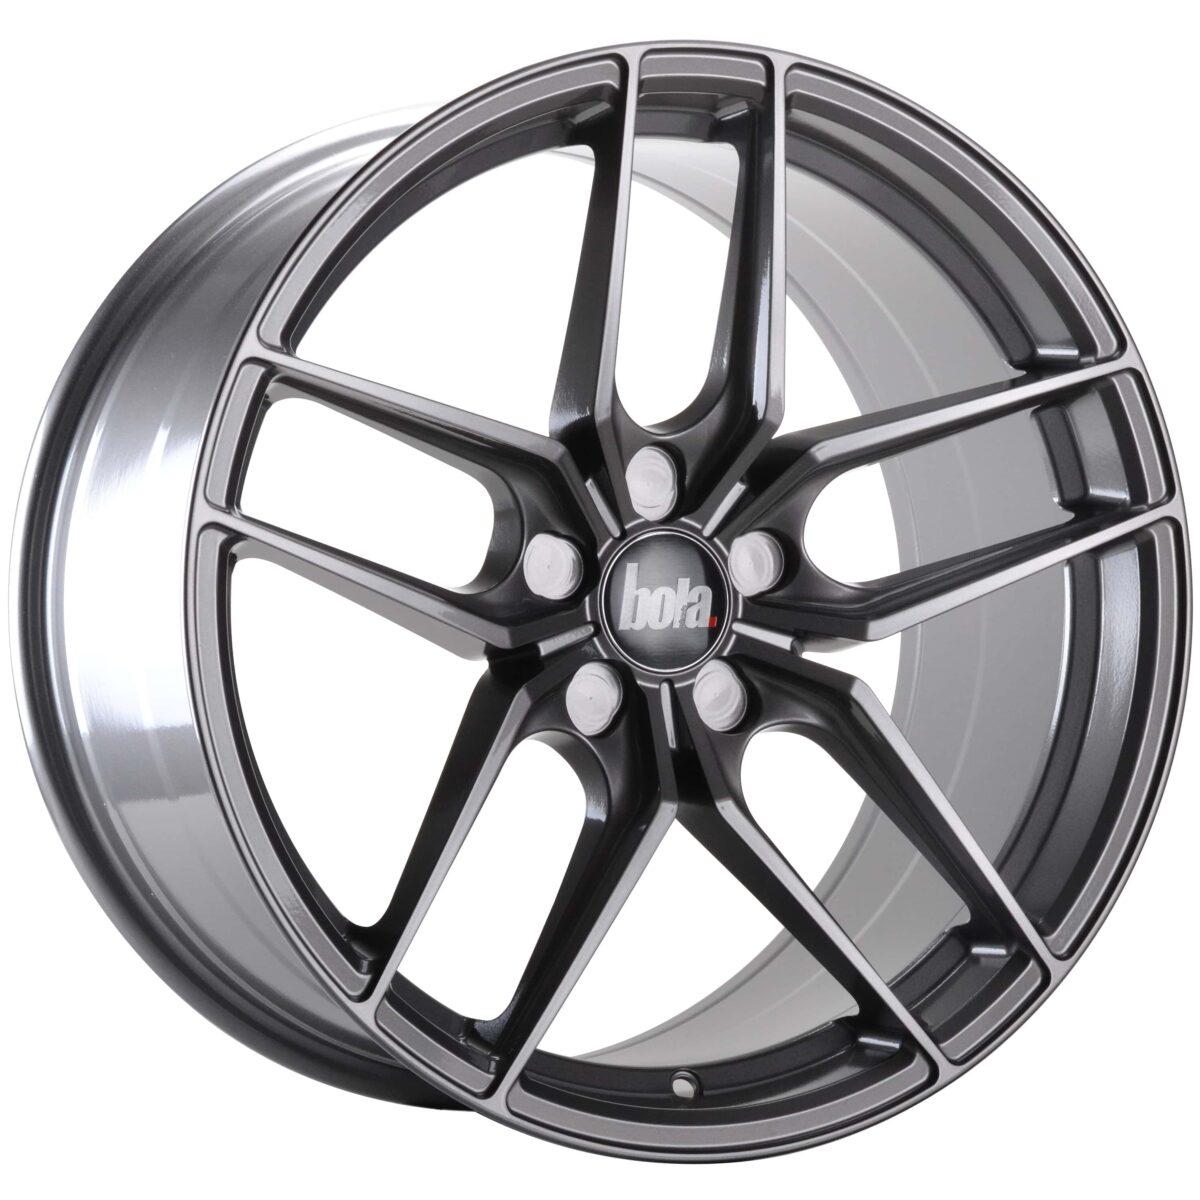 "19"" BOLA B11 Wheels - Light Gunmetal - VW / Audi / Mercedes - 5x112"